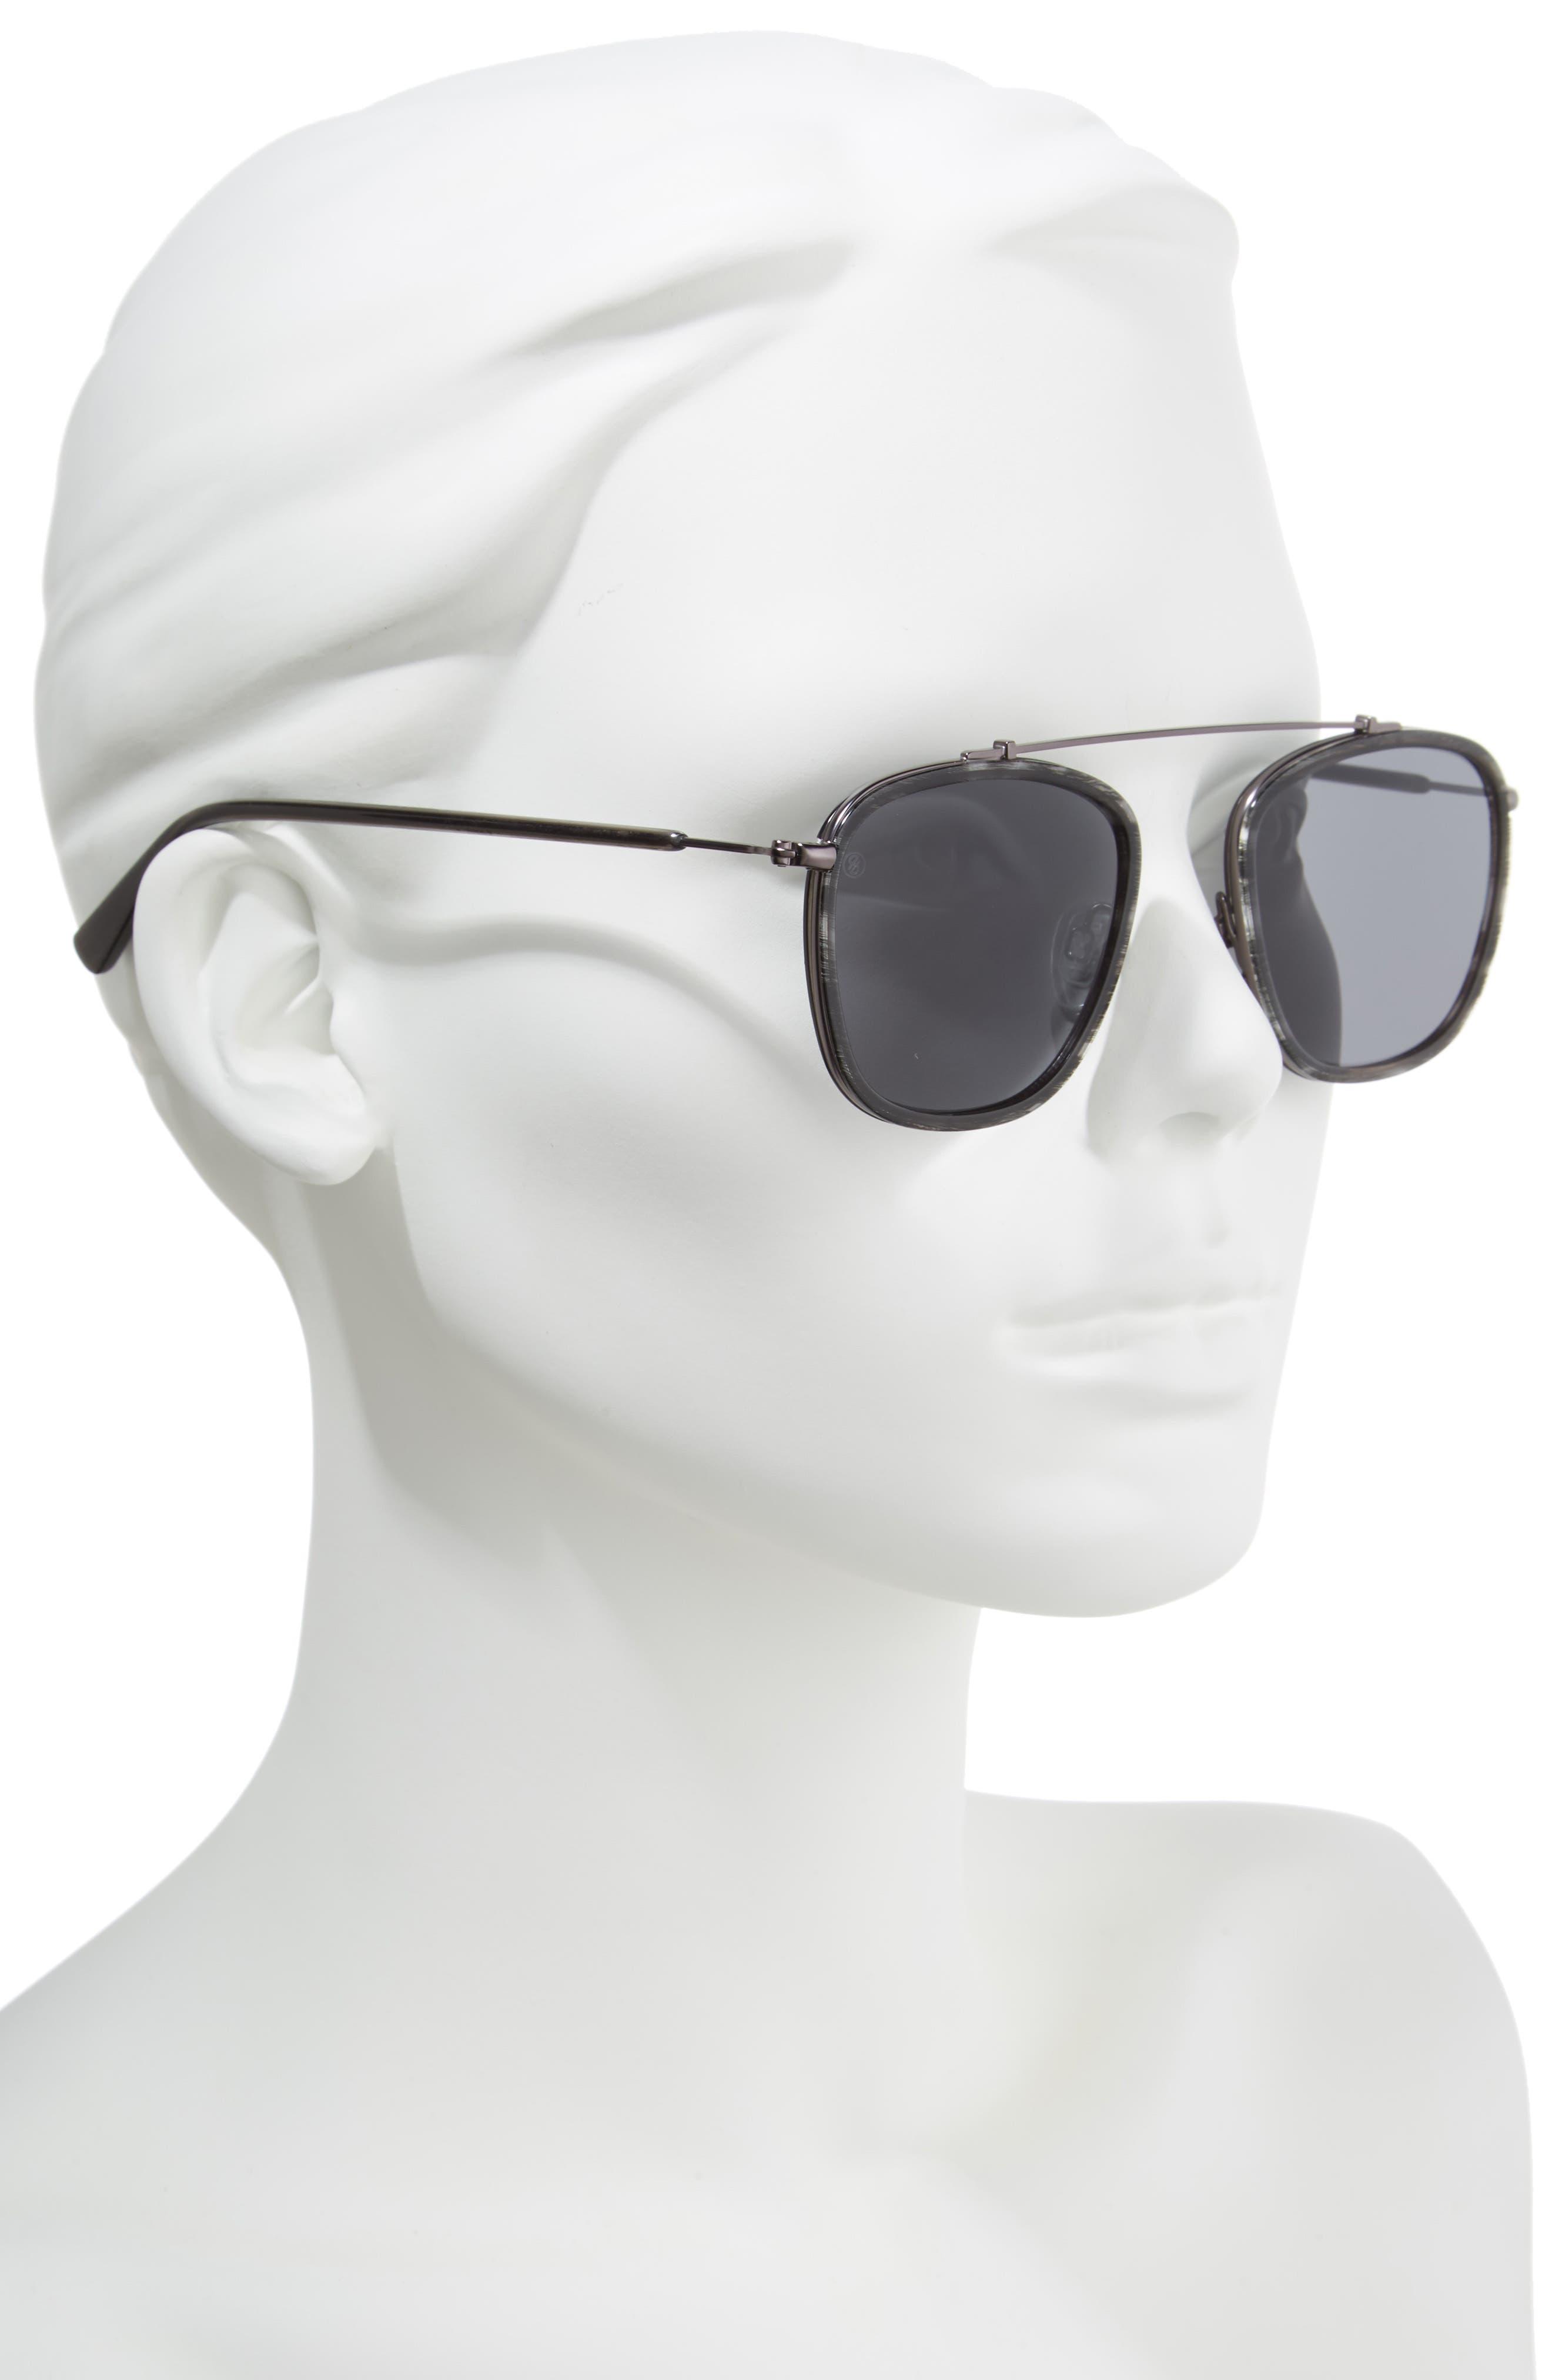 D'BLANC Ceremony 51mm Square Sunglasses,                             Alternate thumbnail 2, color,                             Charcoal Etch/ Grey